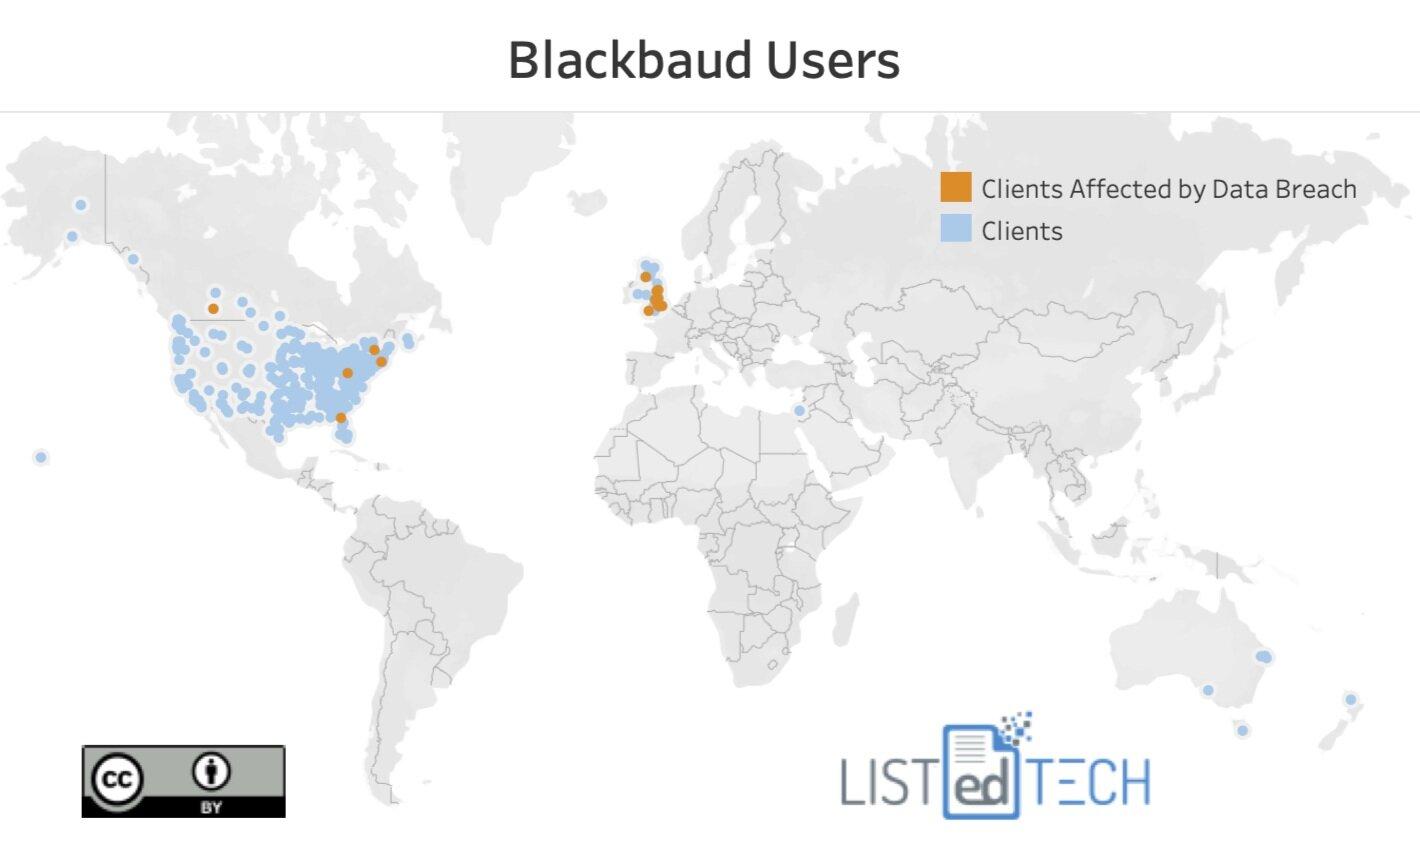 Blackbaud Users - LisTedTECH